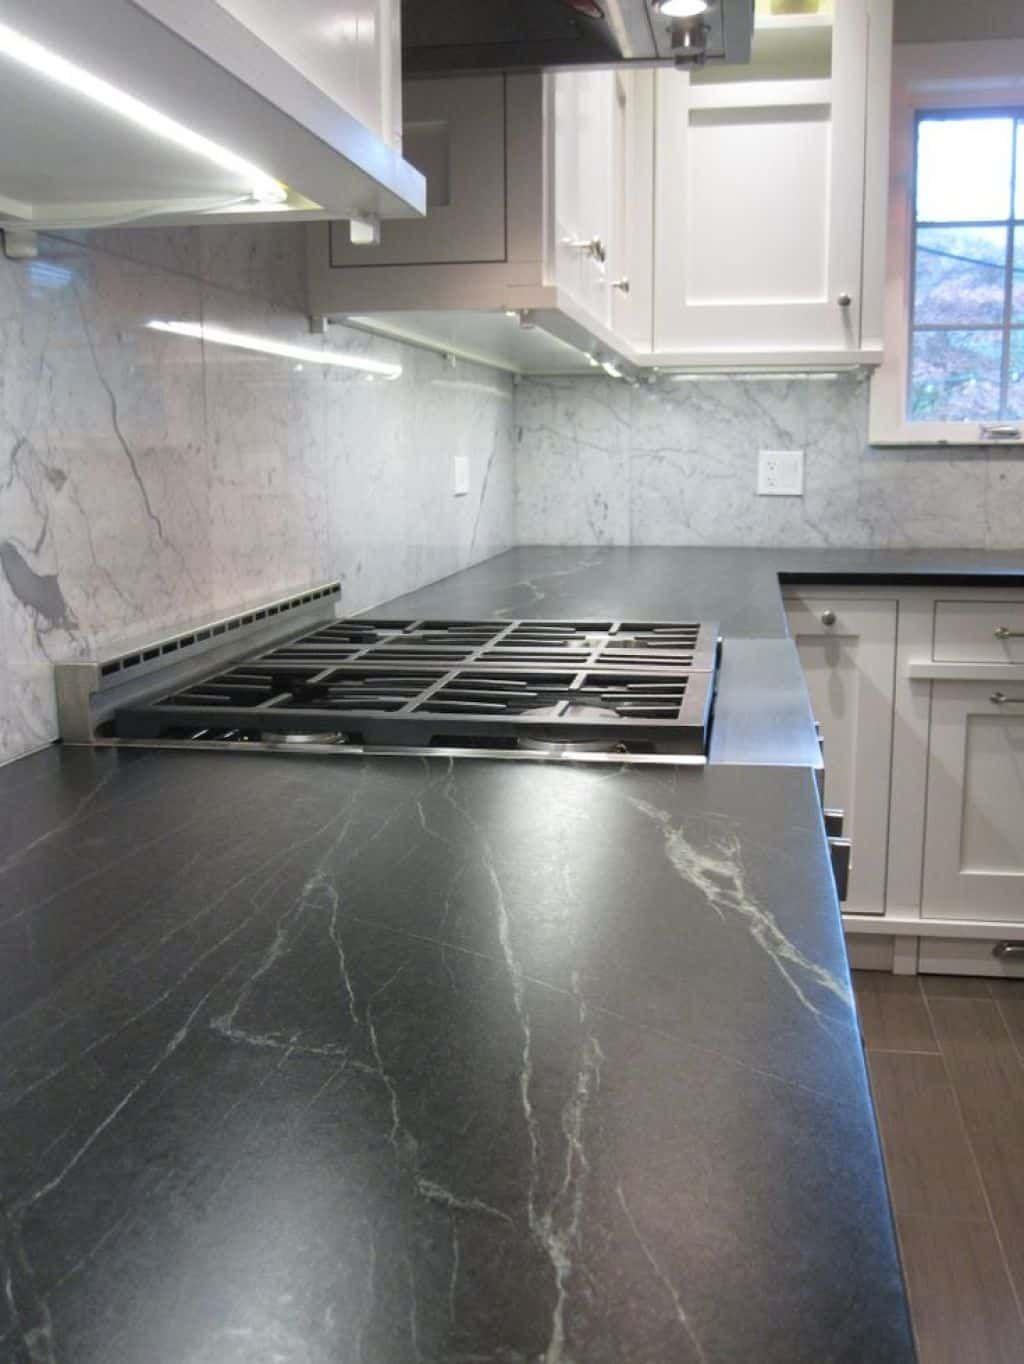 Installing Soapstone Countertops In Your Kitchen Soapstone Countertops Kitchen Countertop Design Countertops